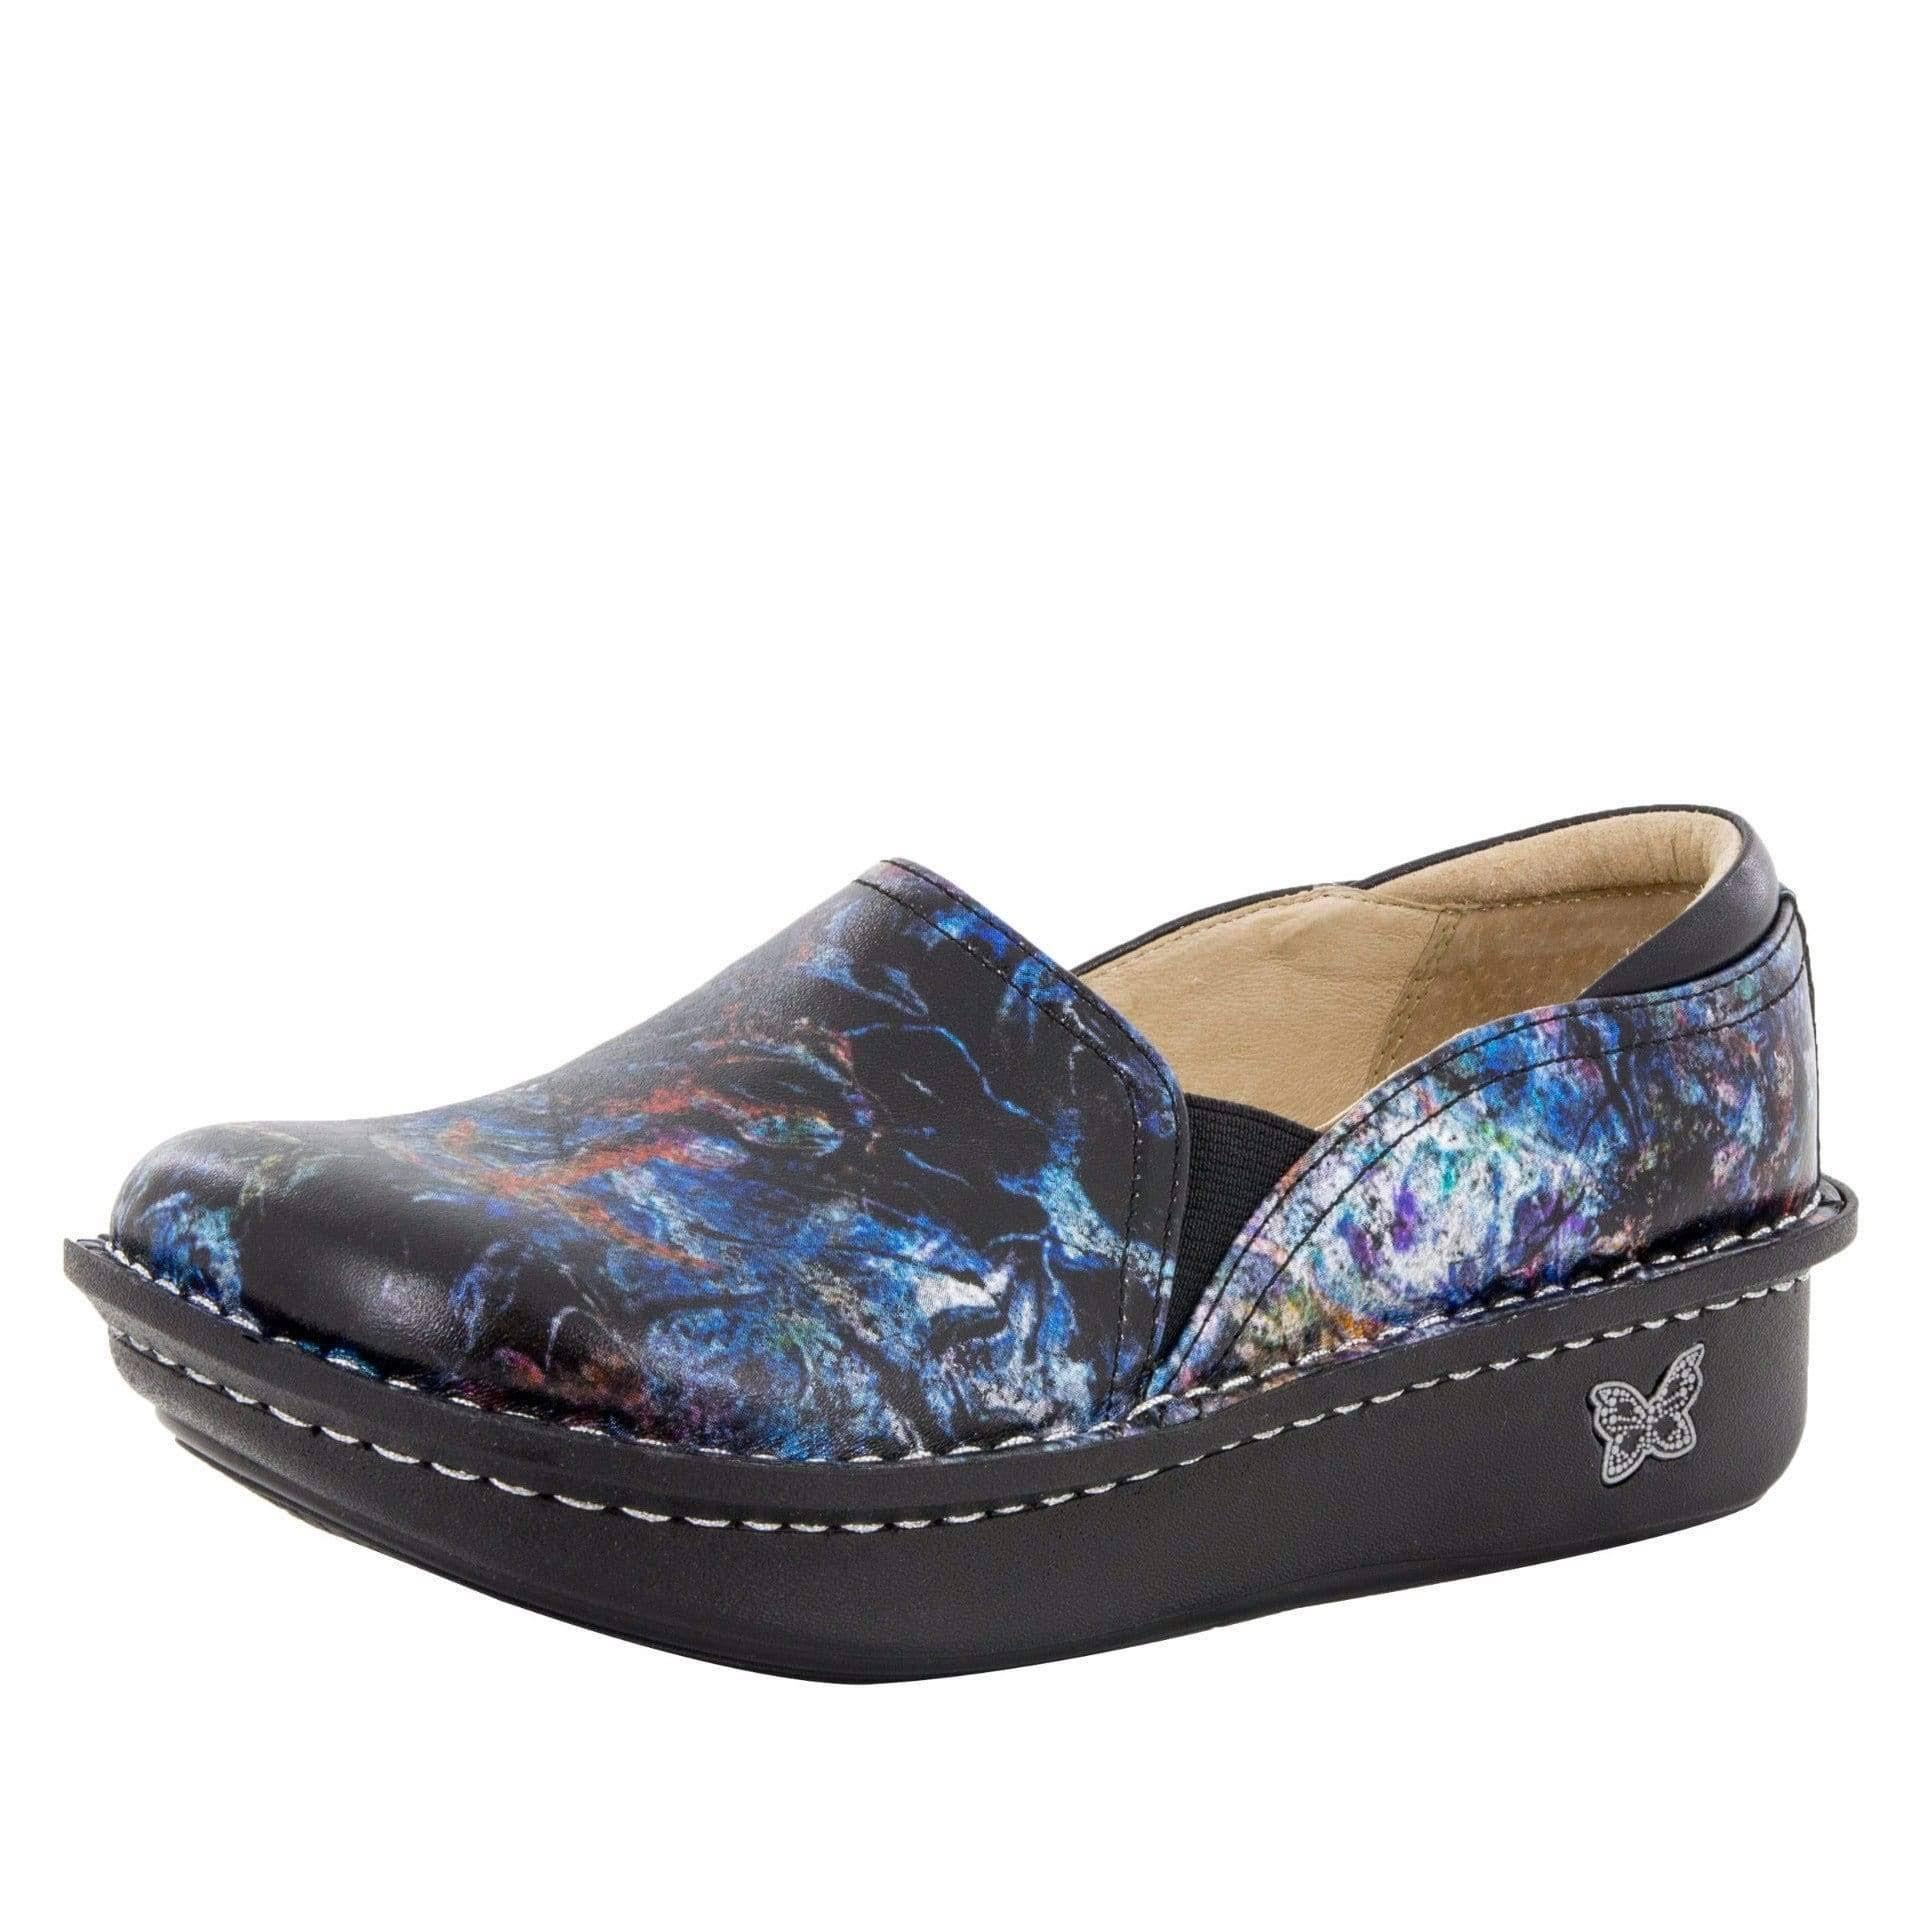 Professional Alegria Nursing Vortex Debra Shoes36 hQsrdCxt